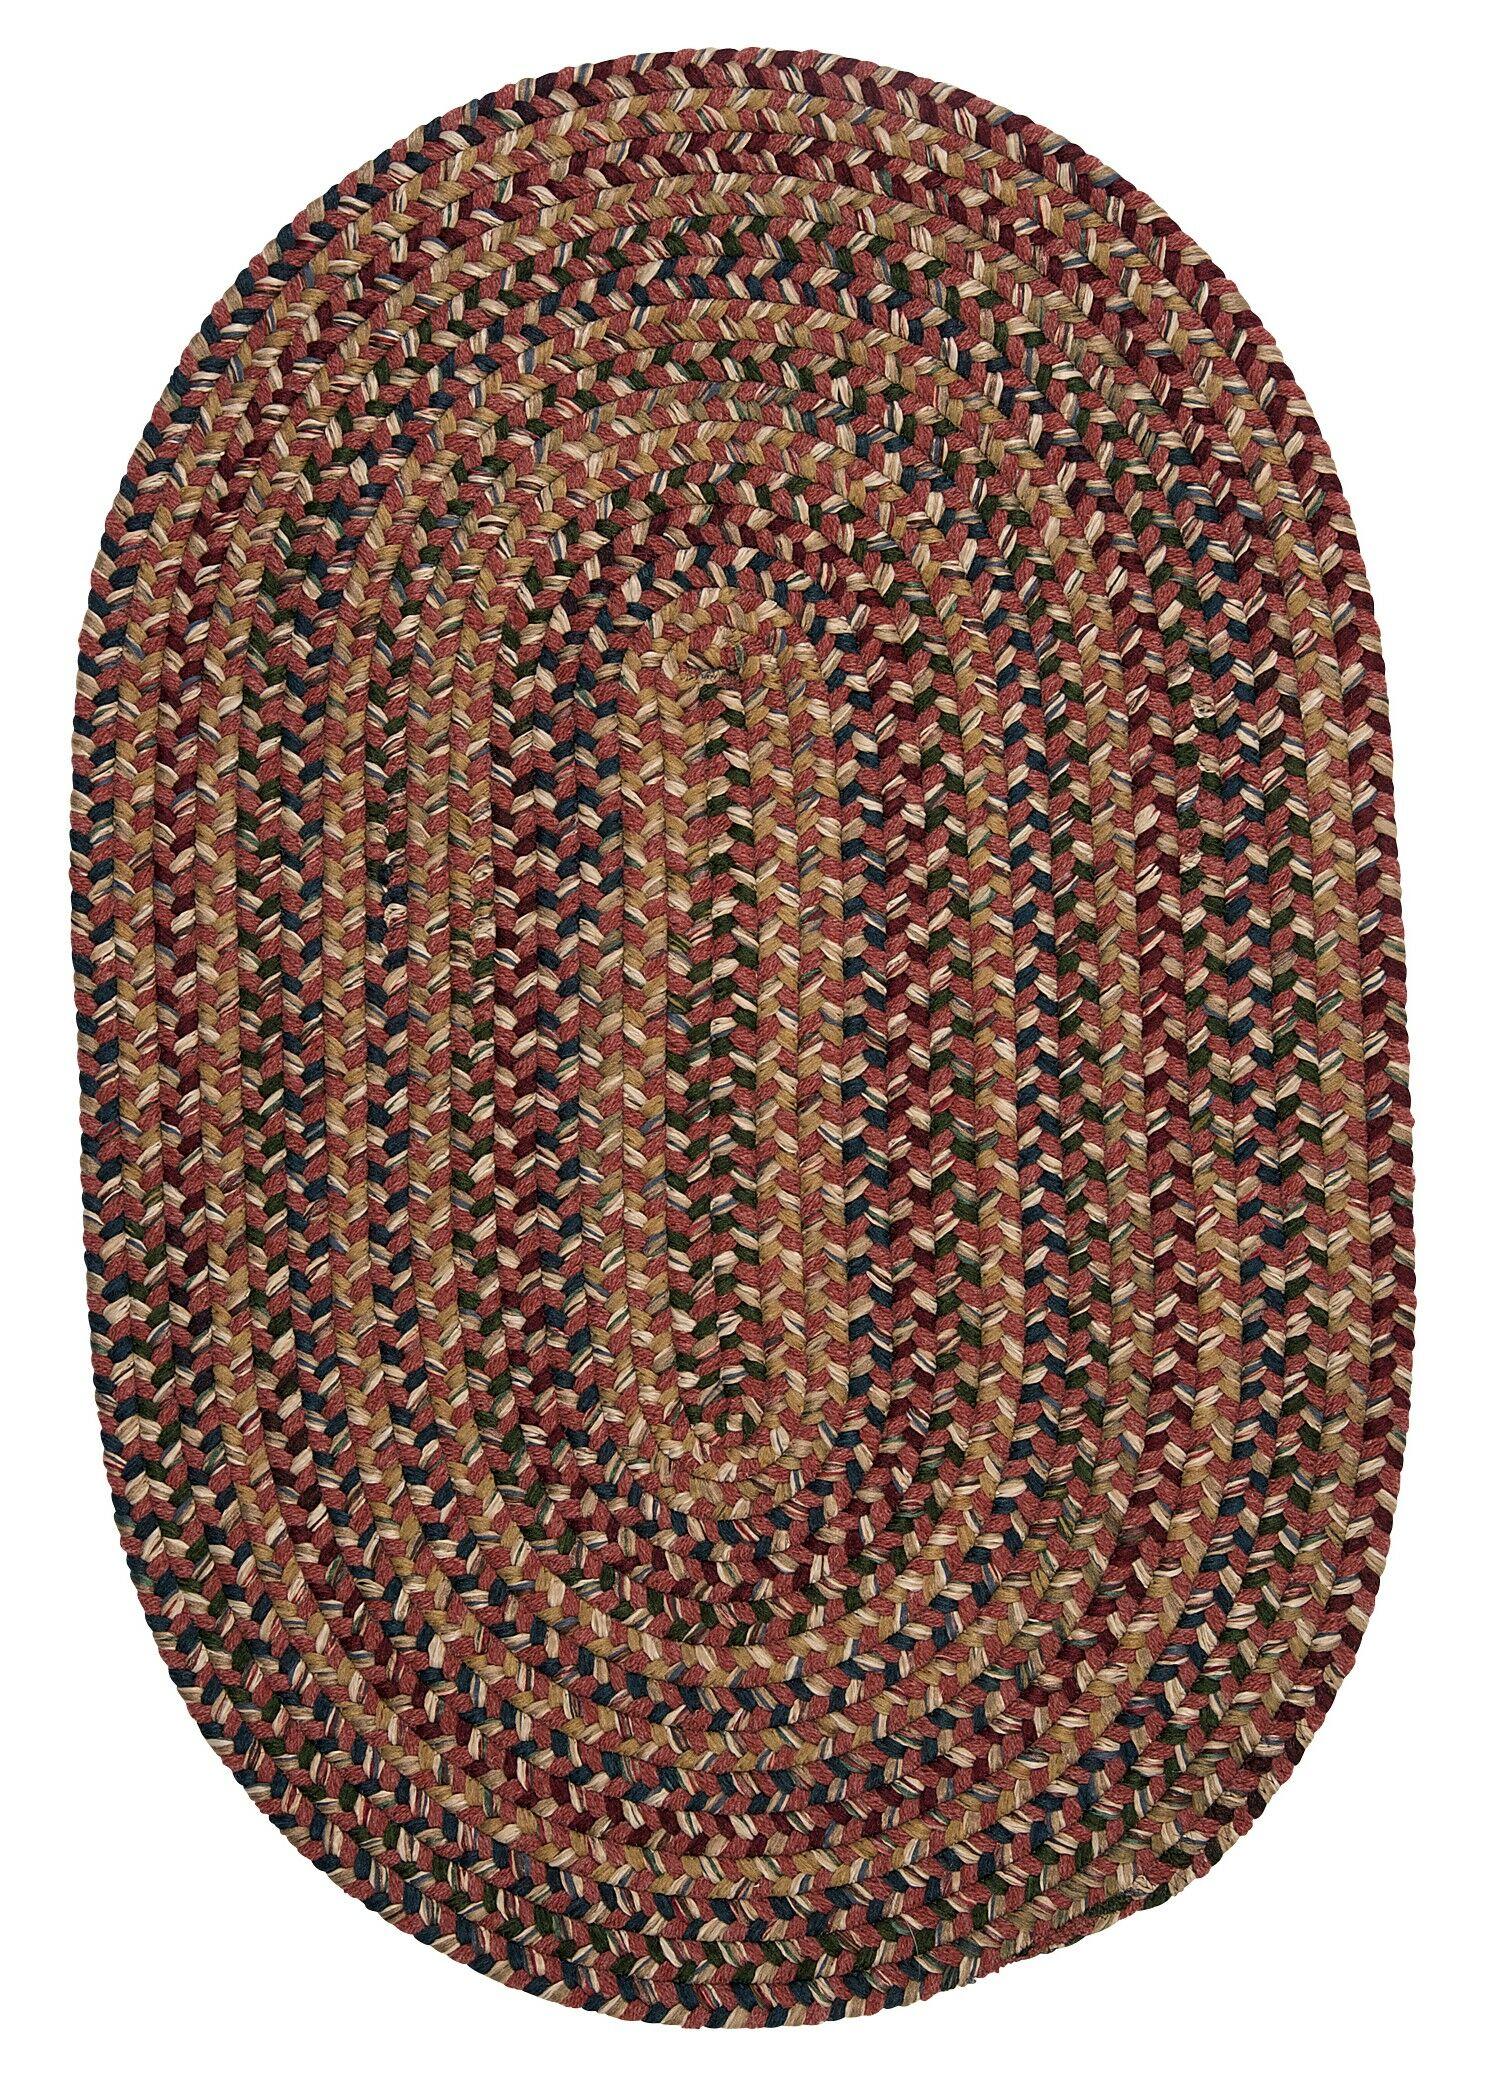 Greenlaw Rosewood Area Rug Rug Size: Oval 3' x 5'